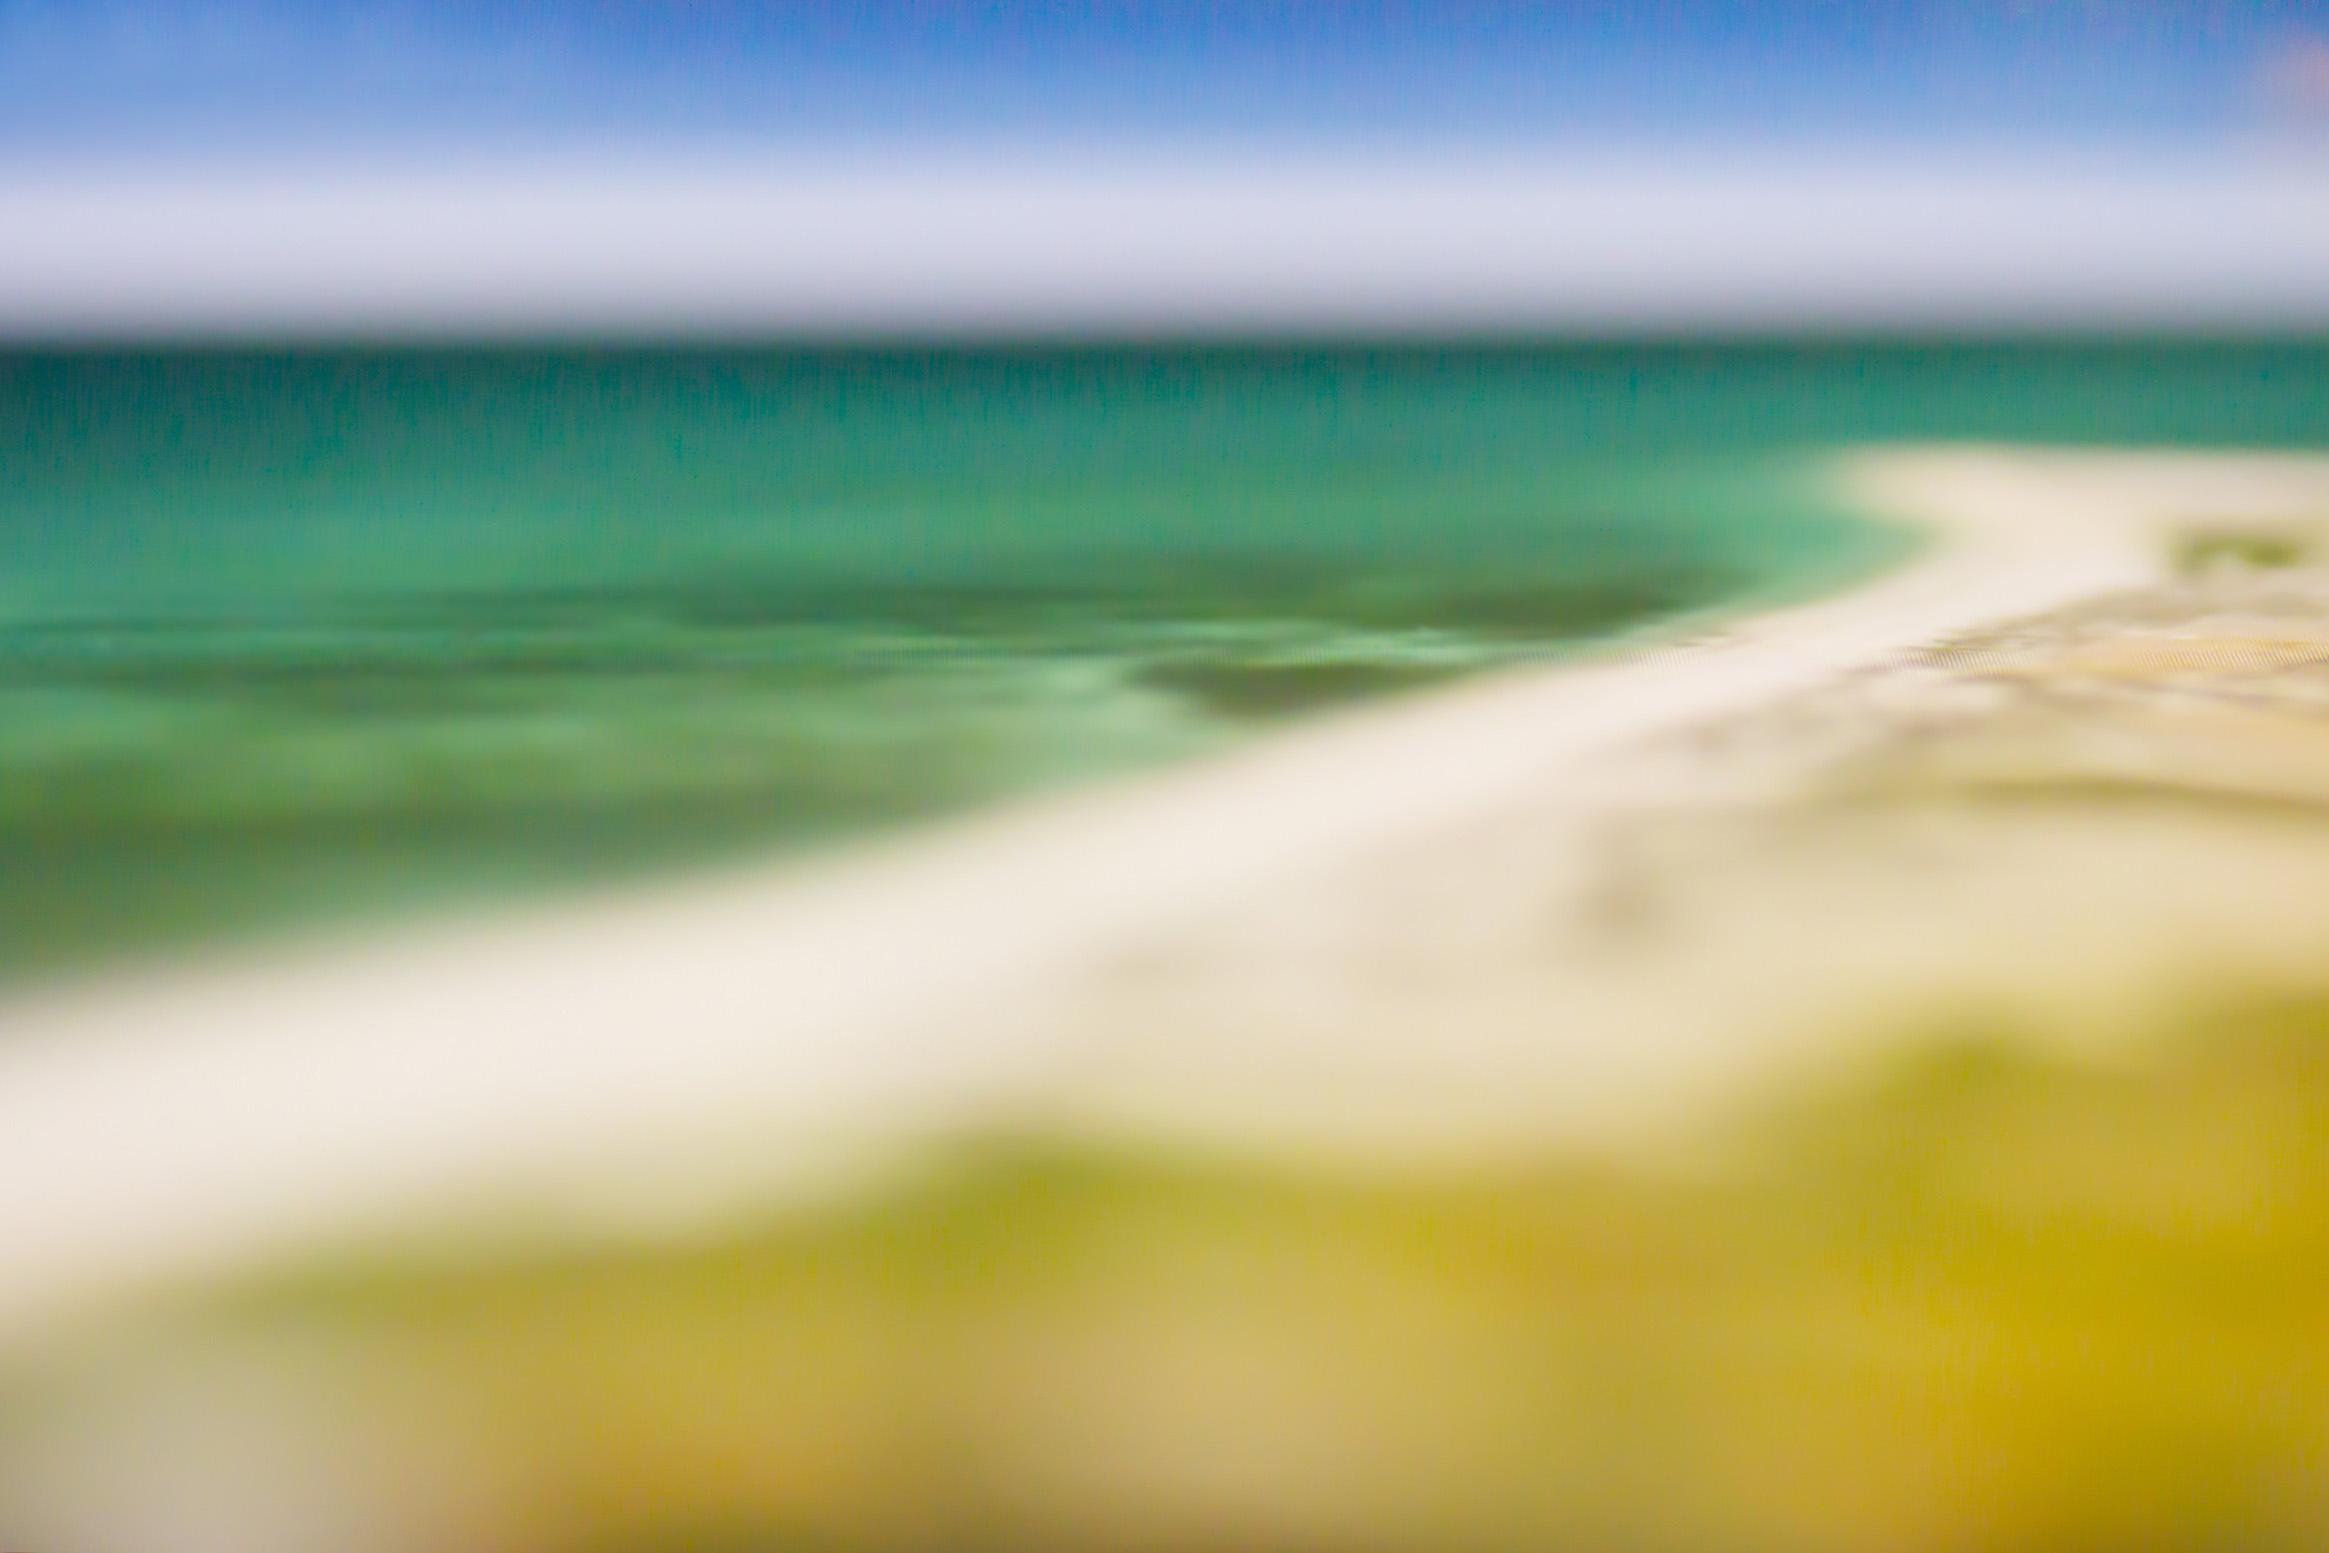 Ras Tanura Beach, Saudi Arabia. 26.45° N, 50.02° E by Mindy Stricke